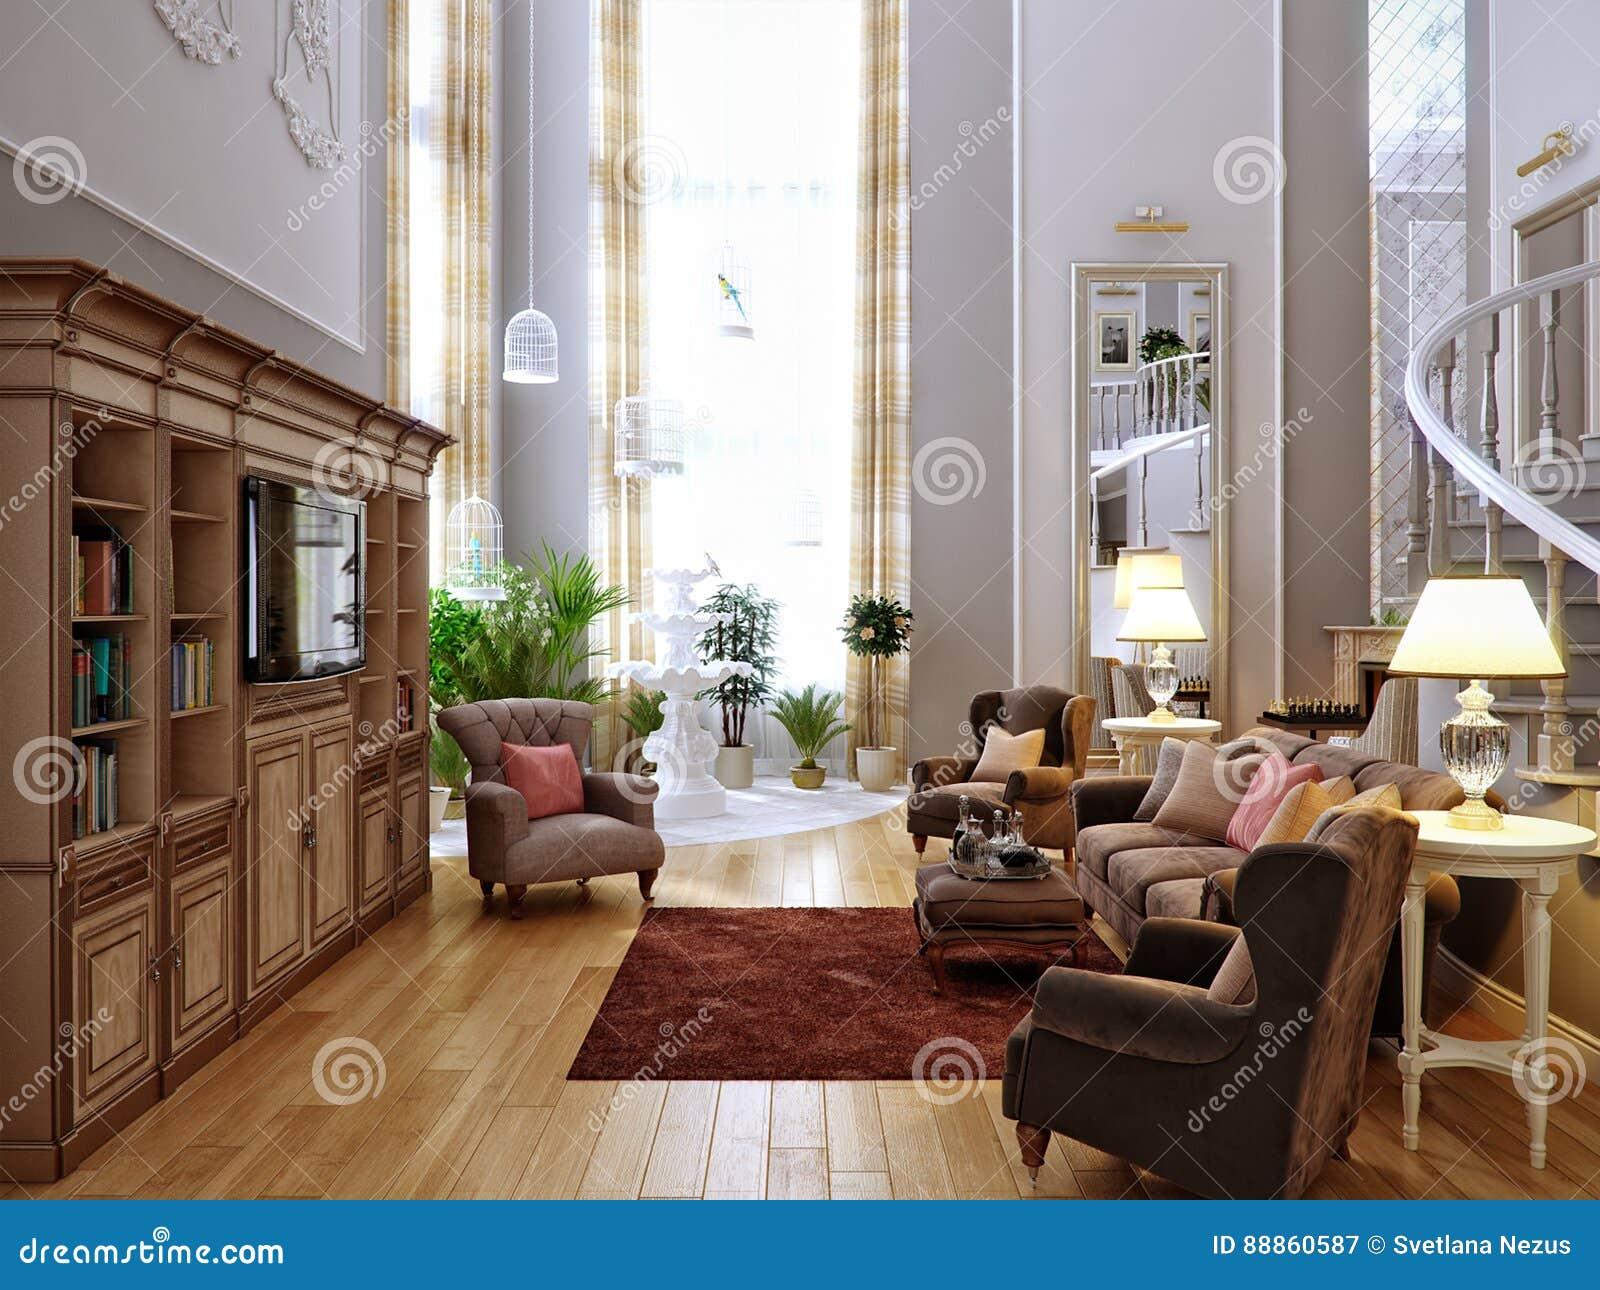 Woonkamer En Keuken : Klassiek woonkamer keuken en eetkamer binnenlands ontwerp stock